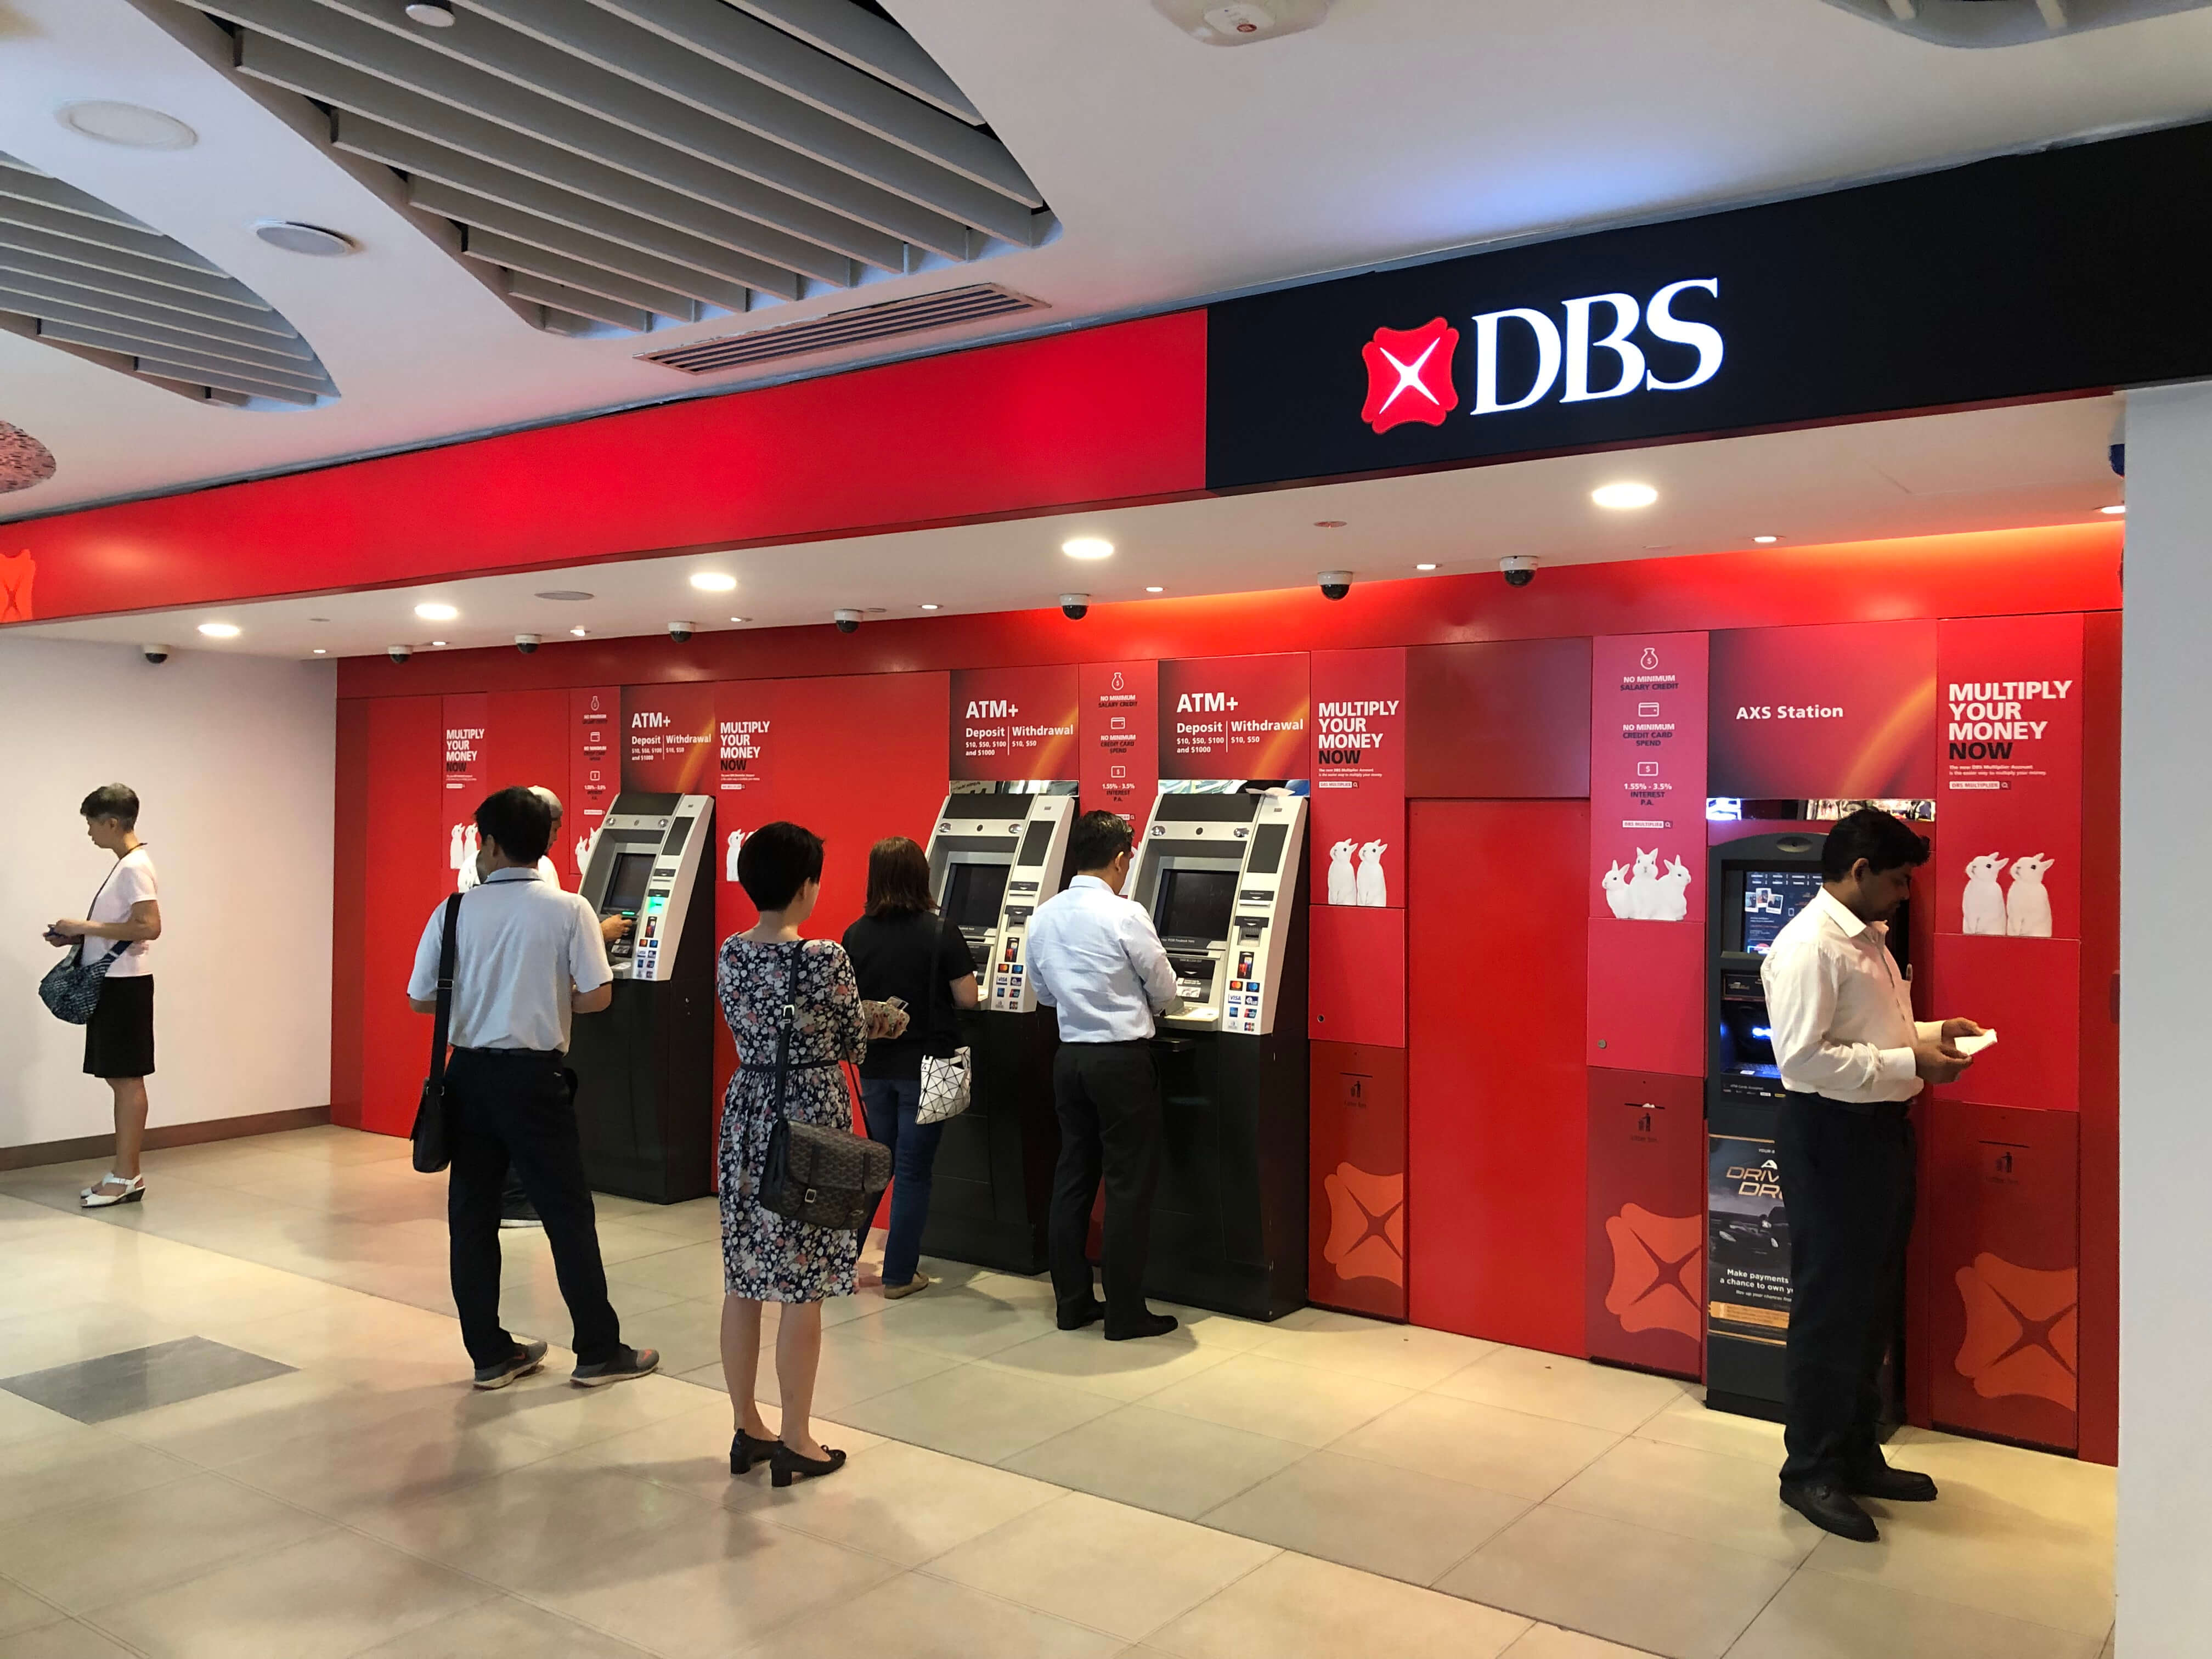 dbs-bank-blog-image